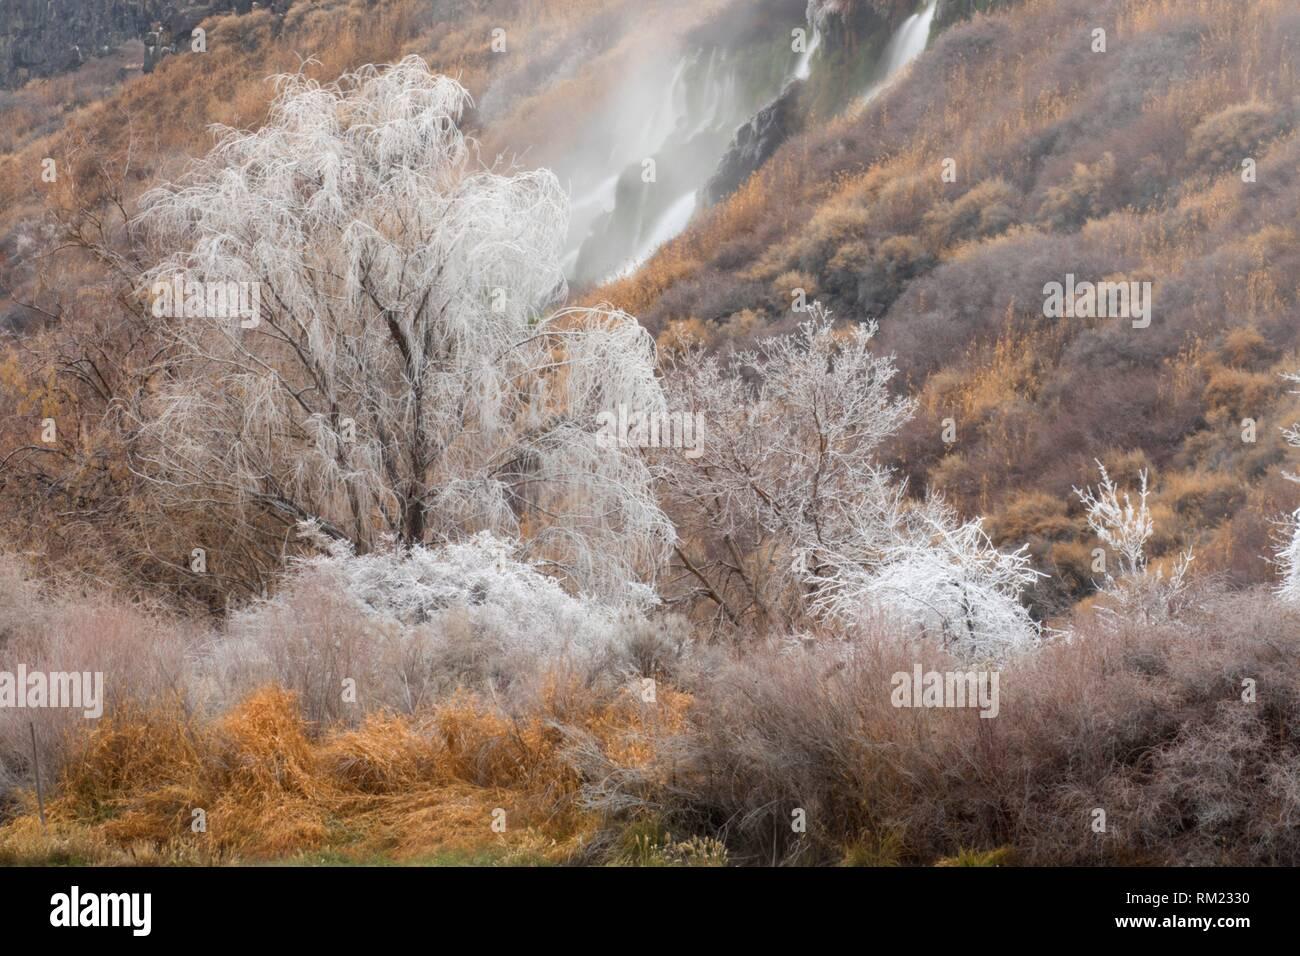 Cascata di ghiaccio spray, Thousand Springs State Park-Ritter Isola, Idaho. Immagini Stock